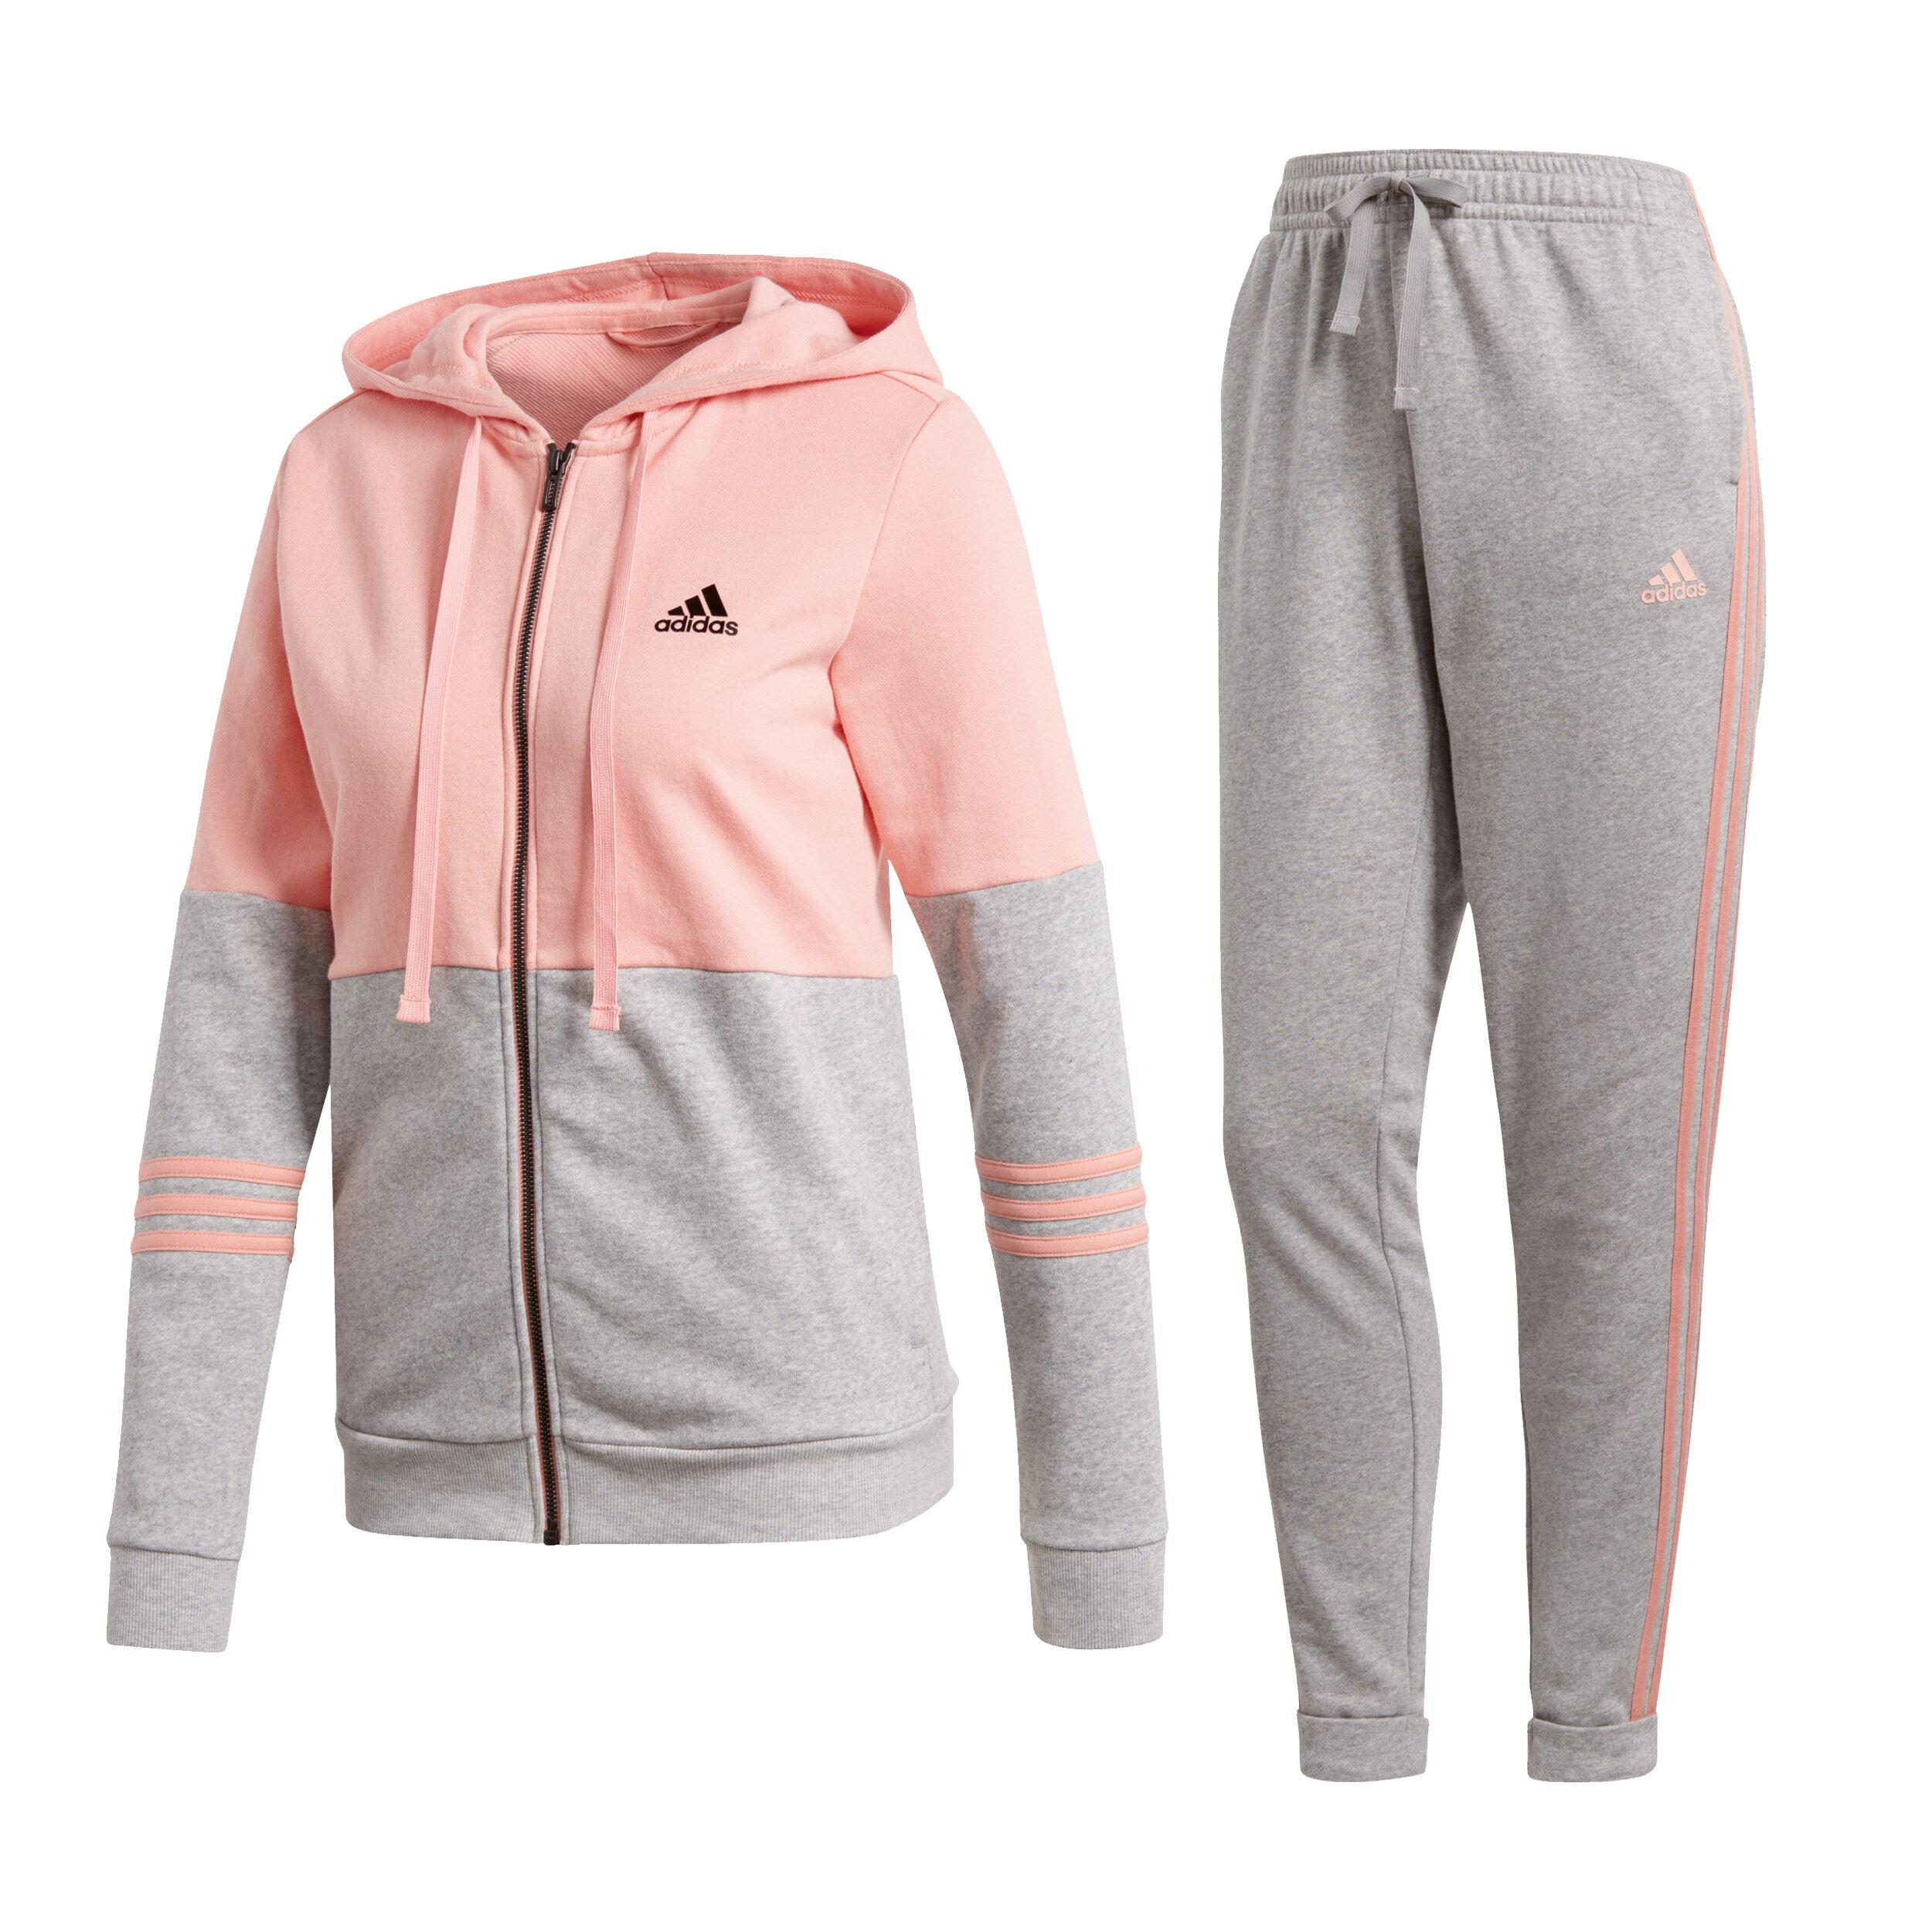 adidas Woven Cotton Energize Trainingsanzug Damen Schwarz